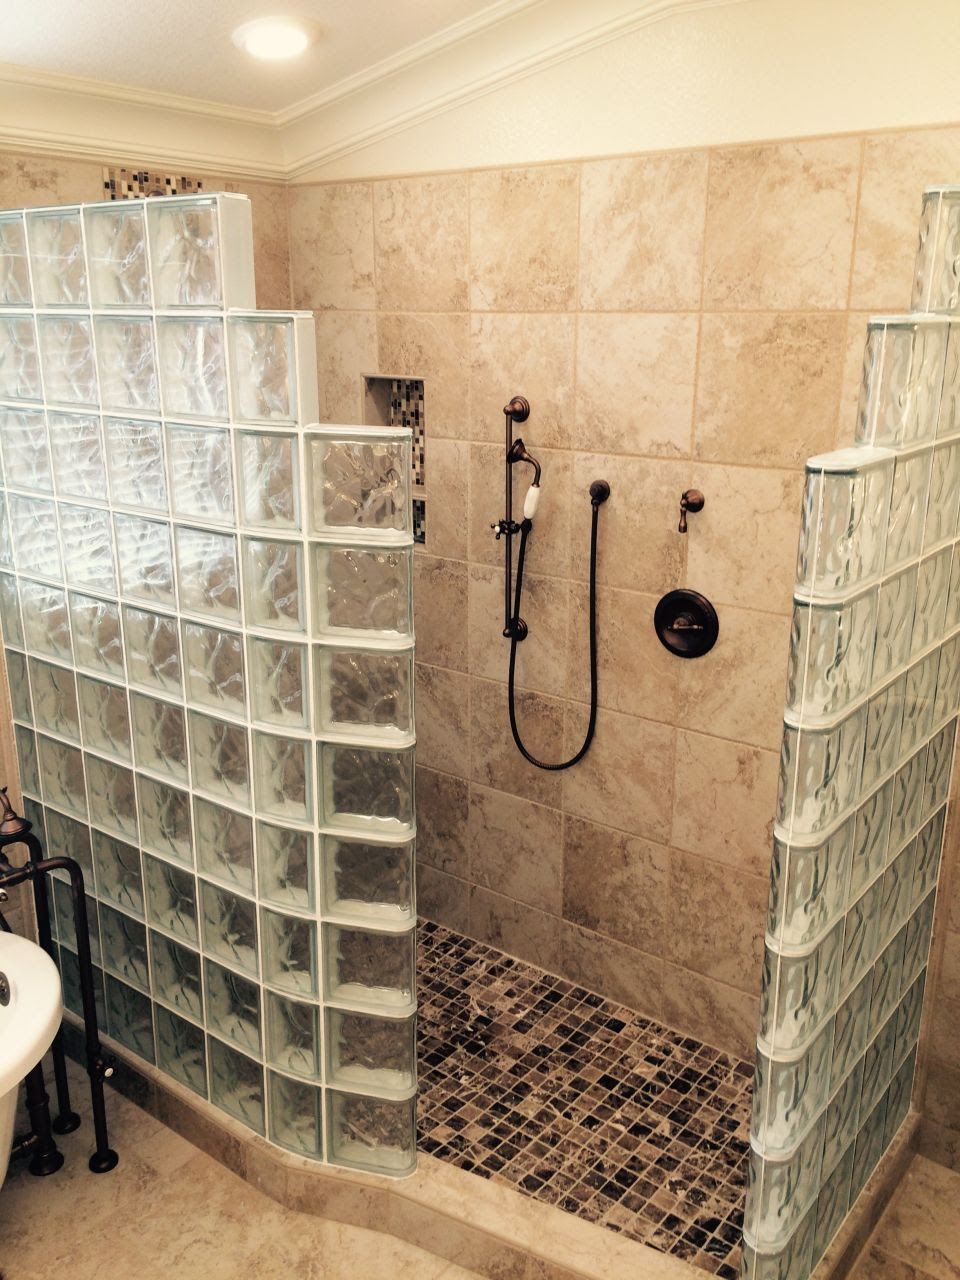 My Customer's Top 5 Fears of a Glass Block Walk In Shower